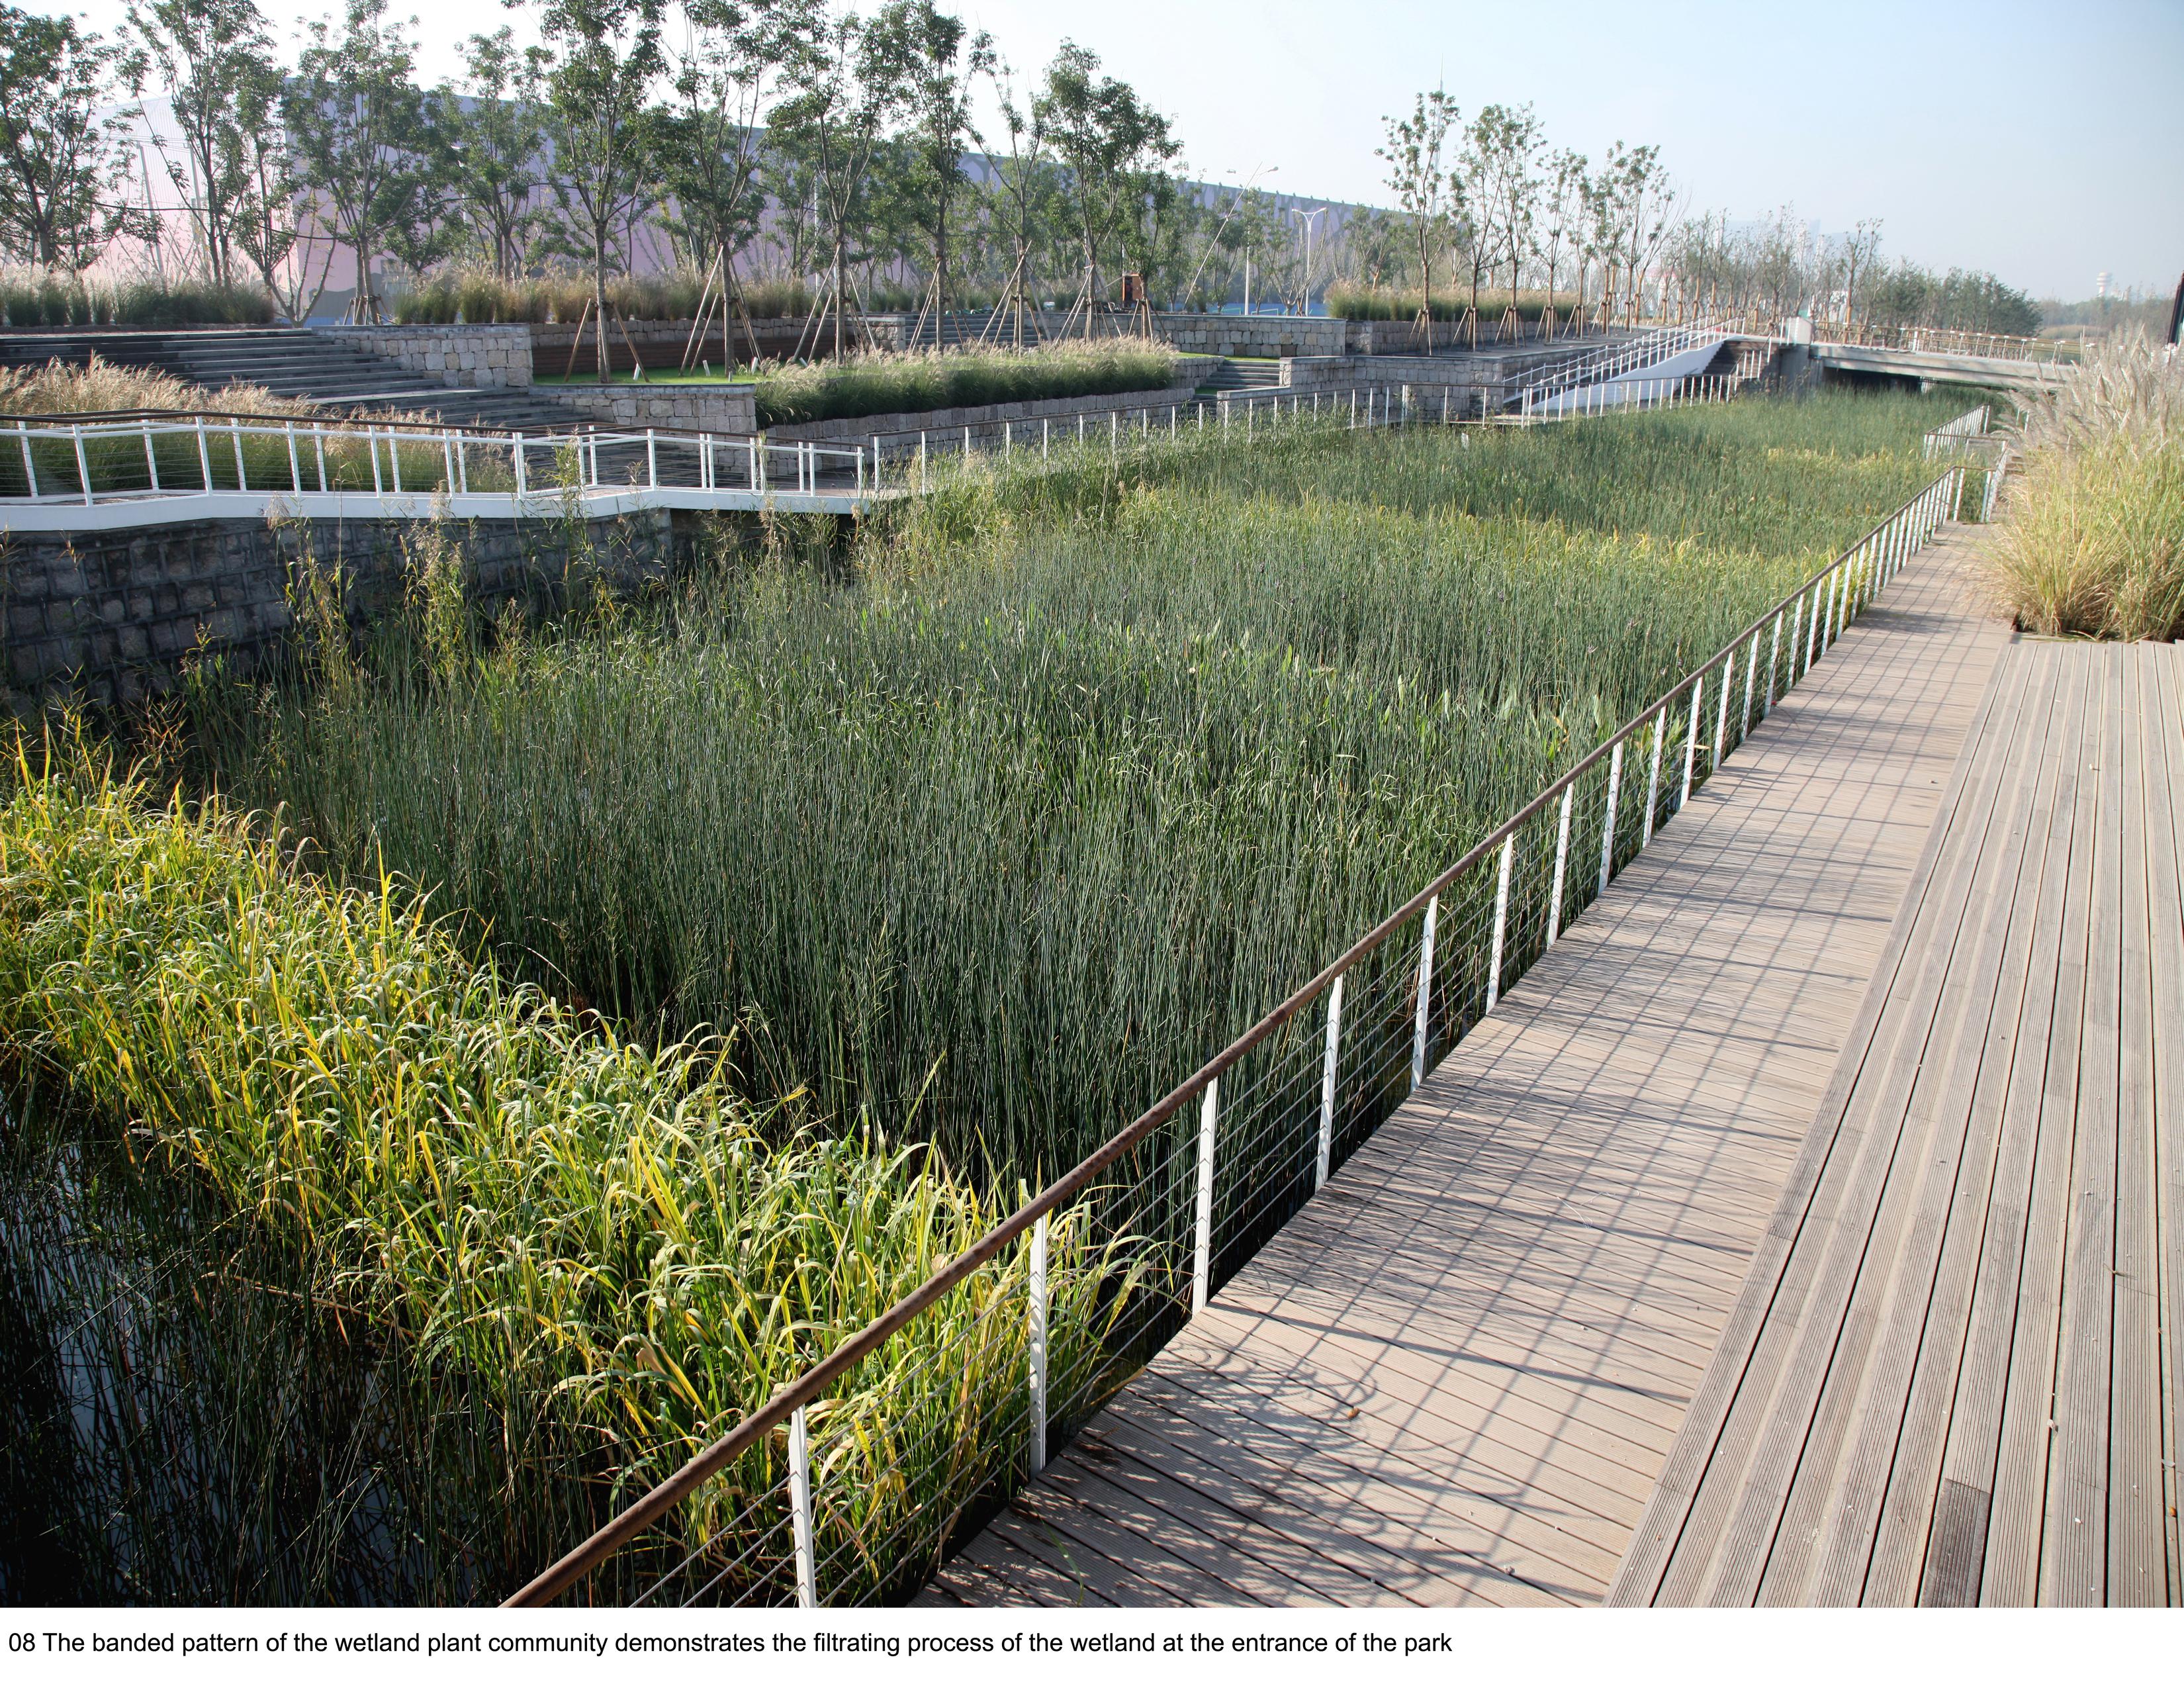 asla 2010 professional awards shanghai houtan park landscape as